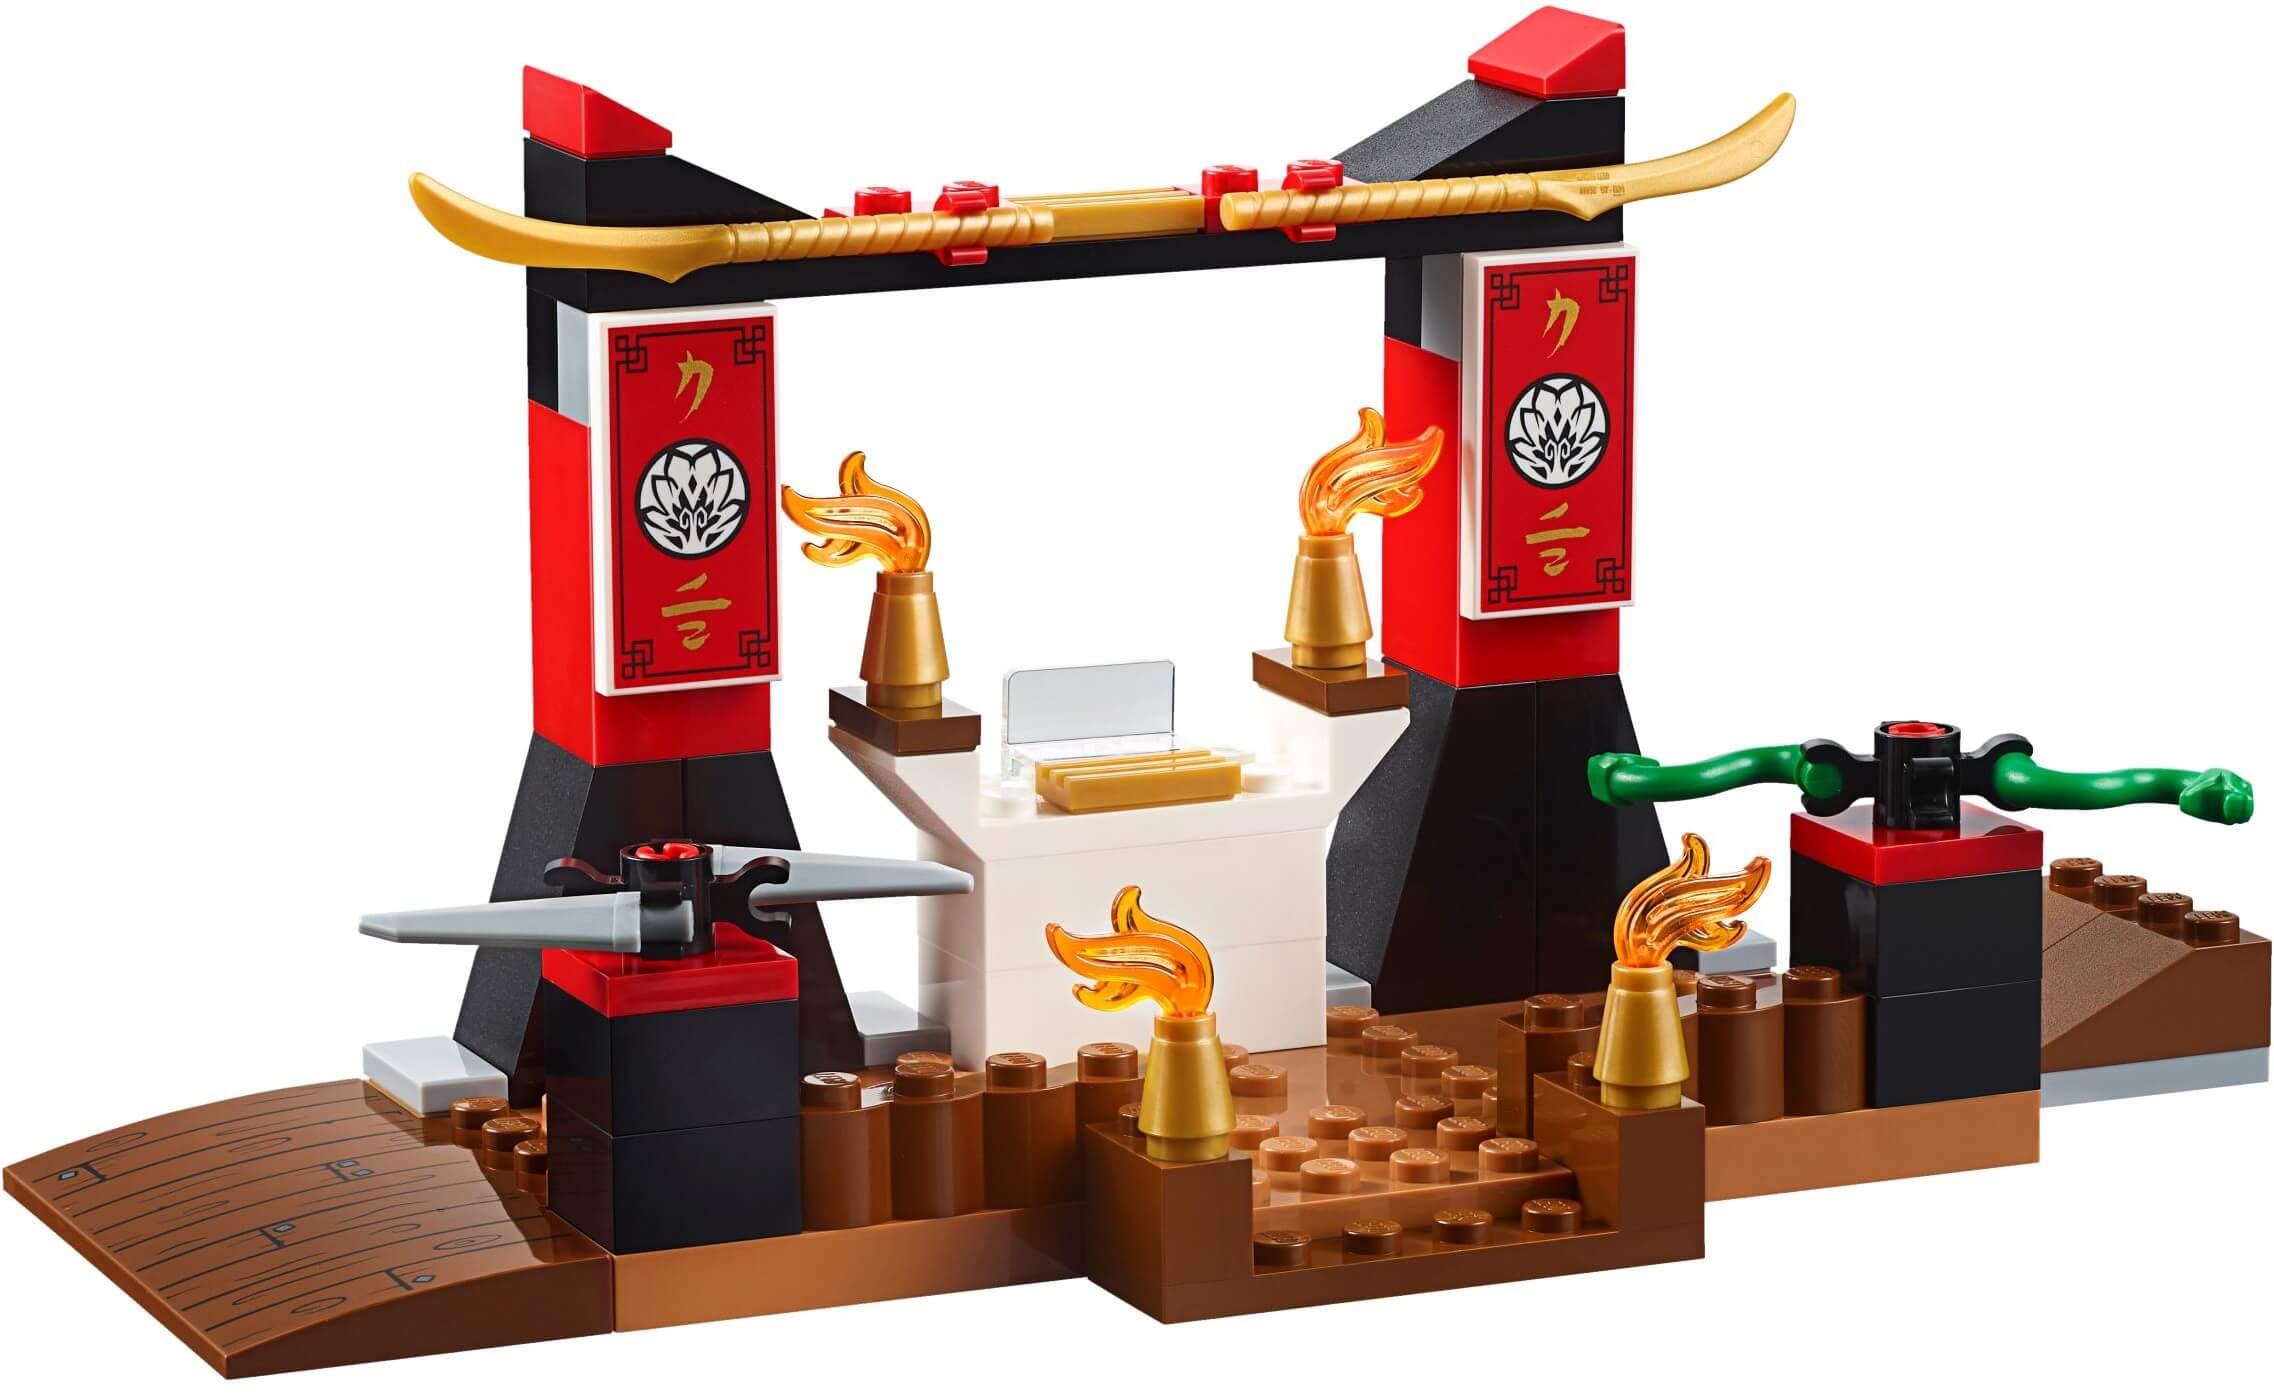 Mua đồ chơi LEGO 10755 - LEGO Juniors 10755 - Siêu Thuyền Ninja của Zane (LEGO Juniors 10755 Zane's Ninja Boat Pursuit)